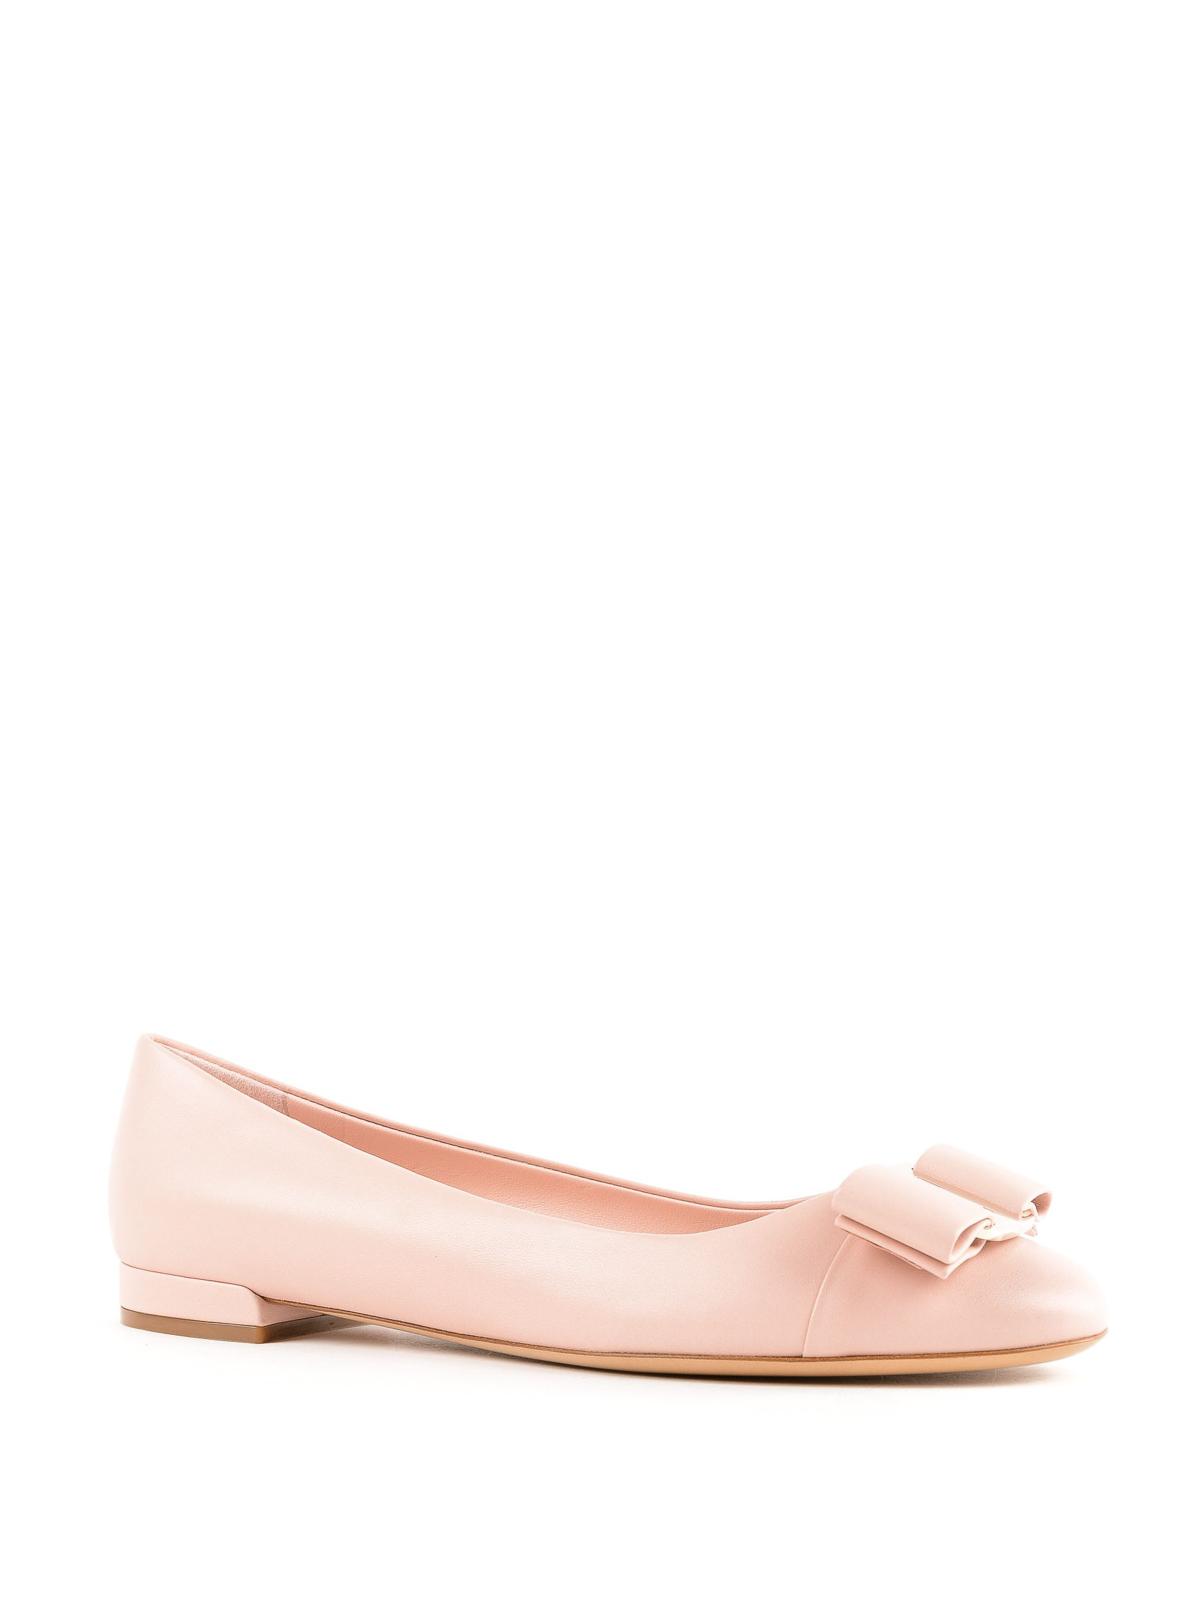 ferragamo pink shoes